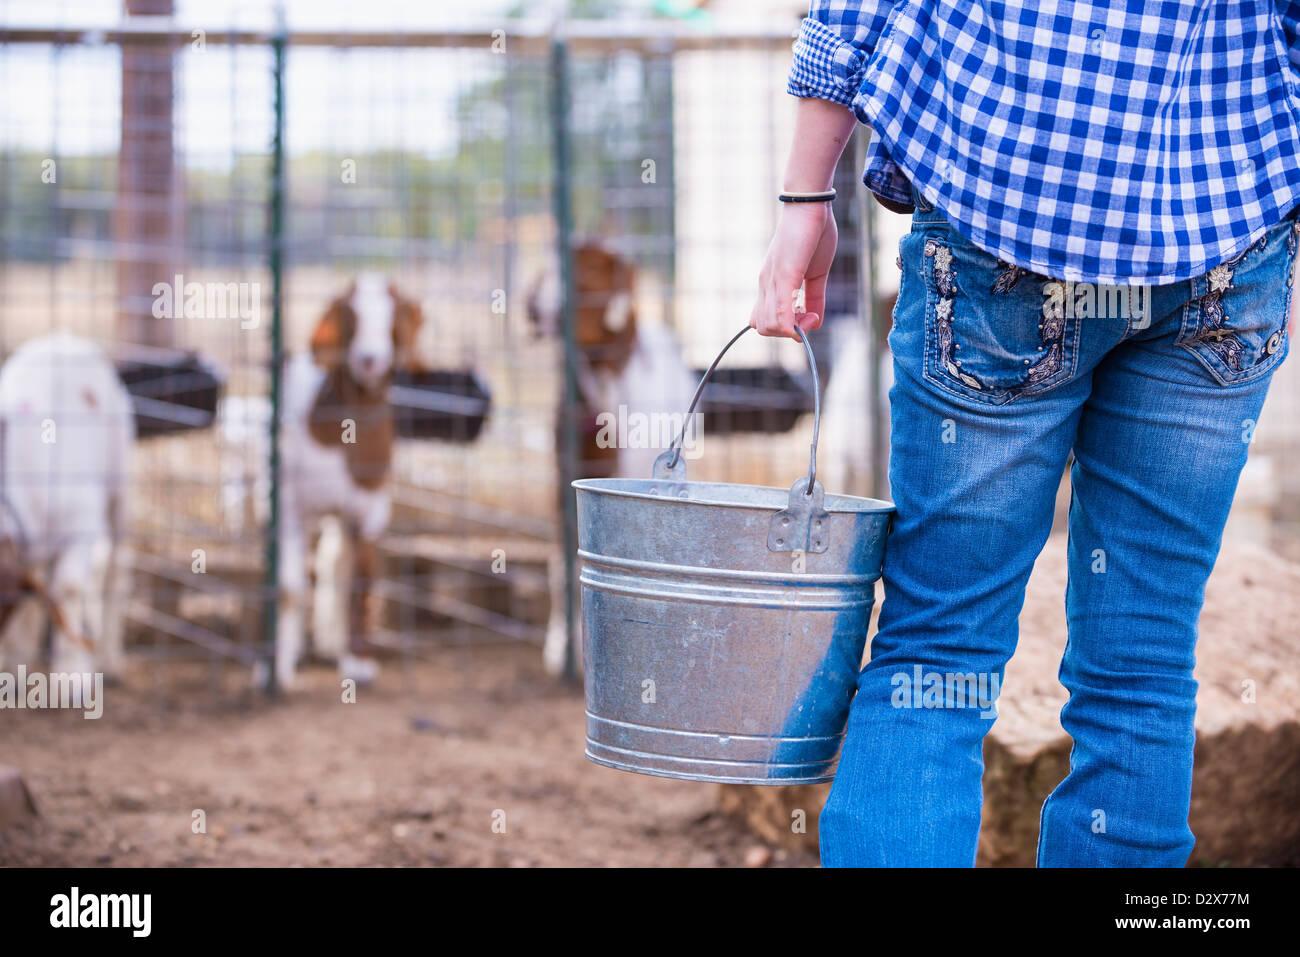 Female teenager feeding goats from a metal bucket on livestock farm - Stock Image